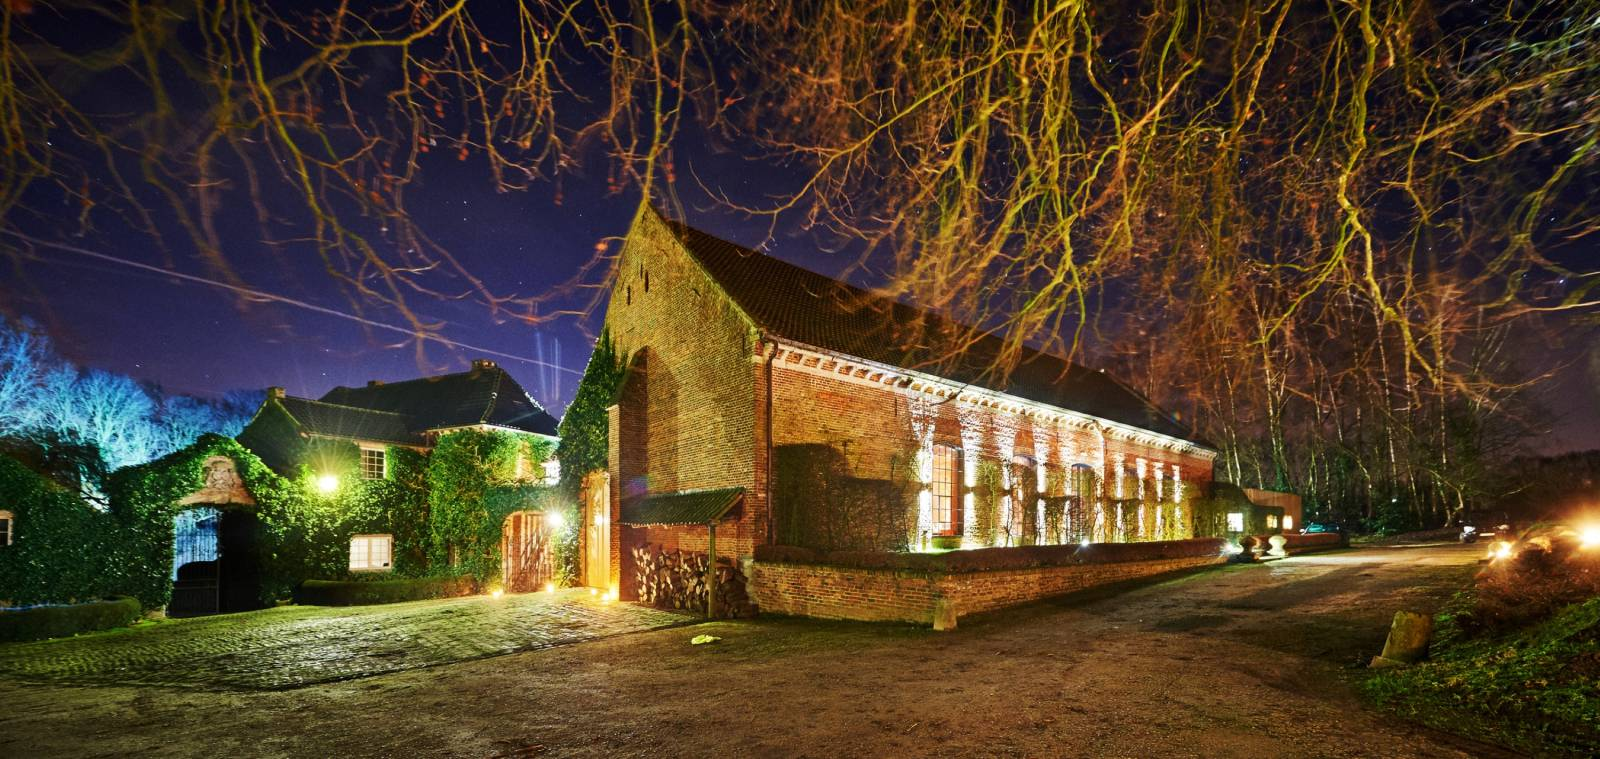 La ferme de Balingue House of Weddings feestzaal salle de fete lieu exceptionnel huwelijk mariage trouwen trouwzaal Brusse (4)